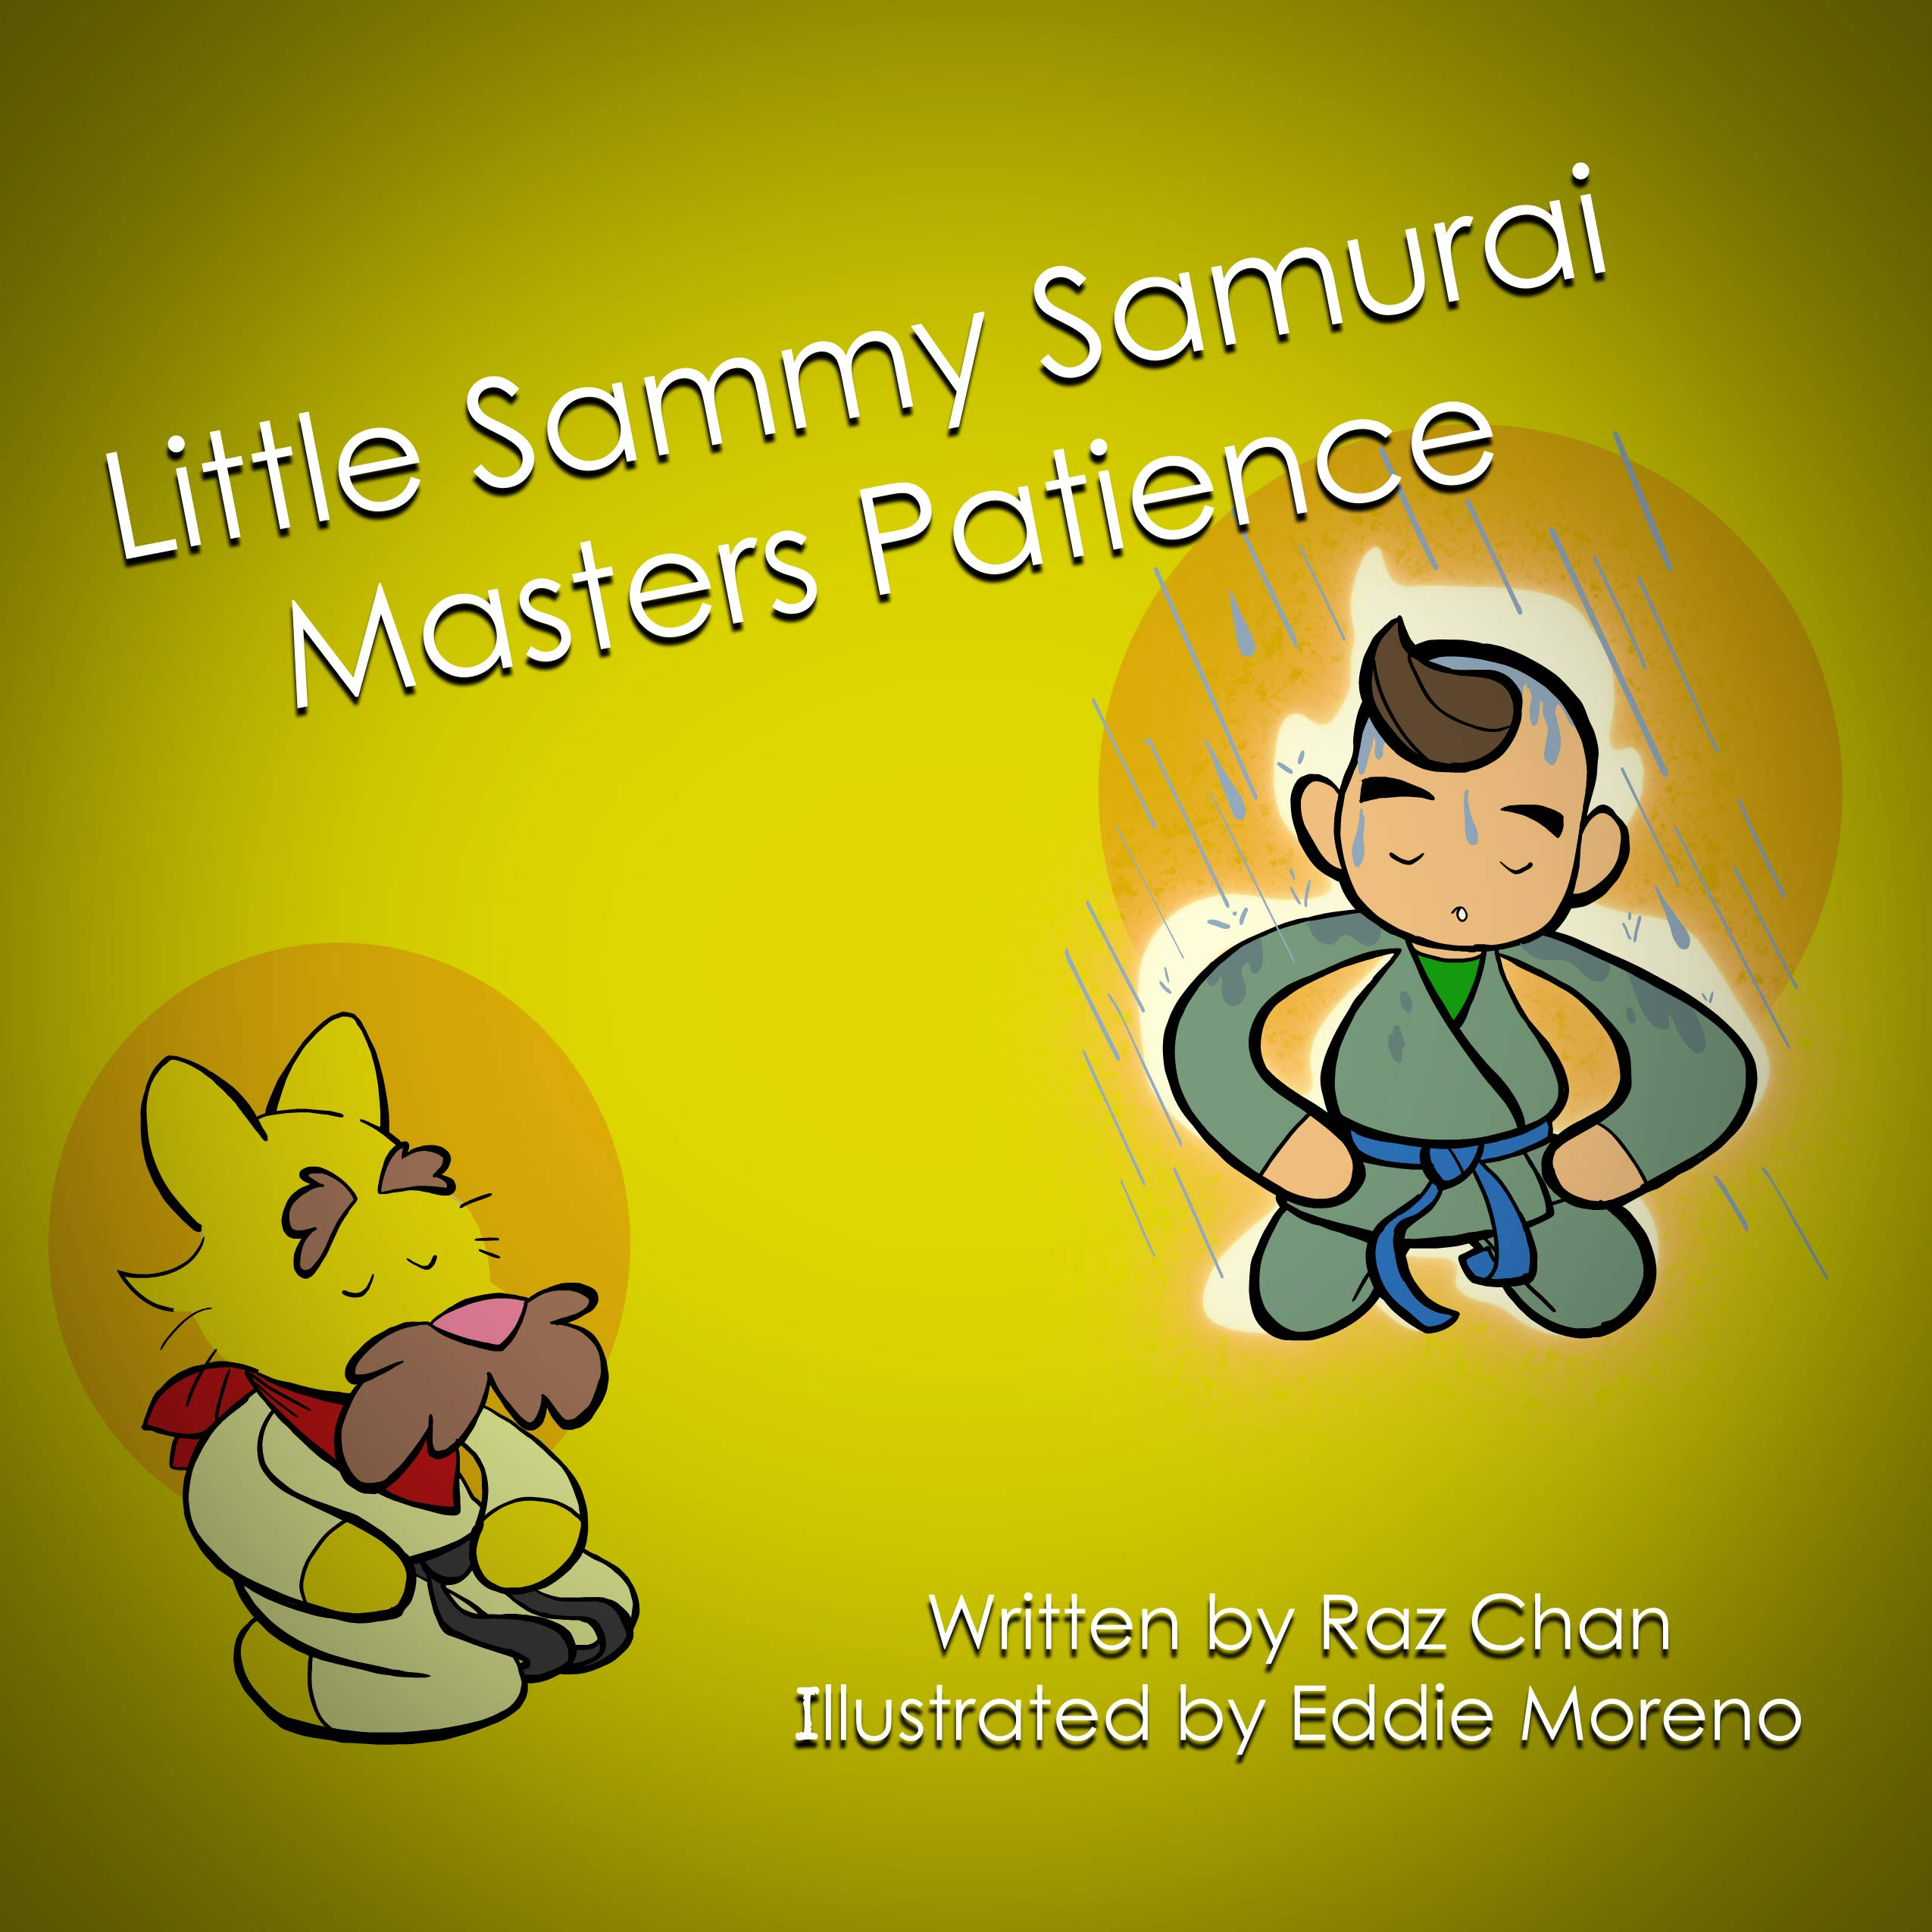 Little Sammy Samurai Masters Patience: A Children's Book About Perseverance and Diligence (Little Sammy Samurai & Dojo Max Life Skills Series 8)